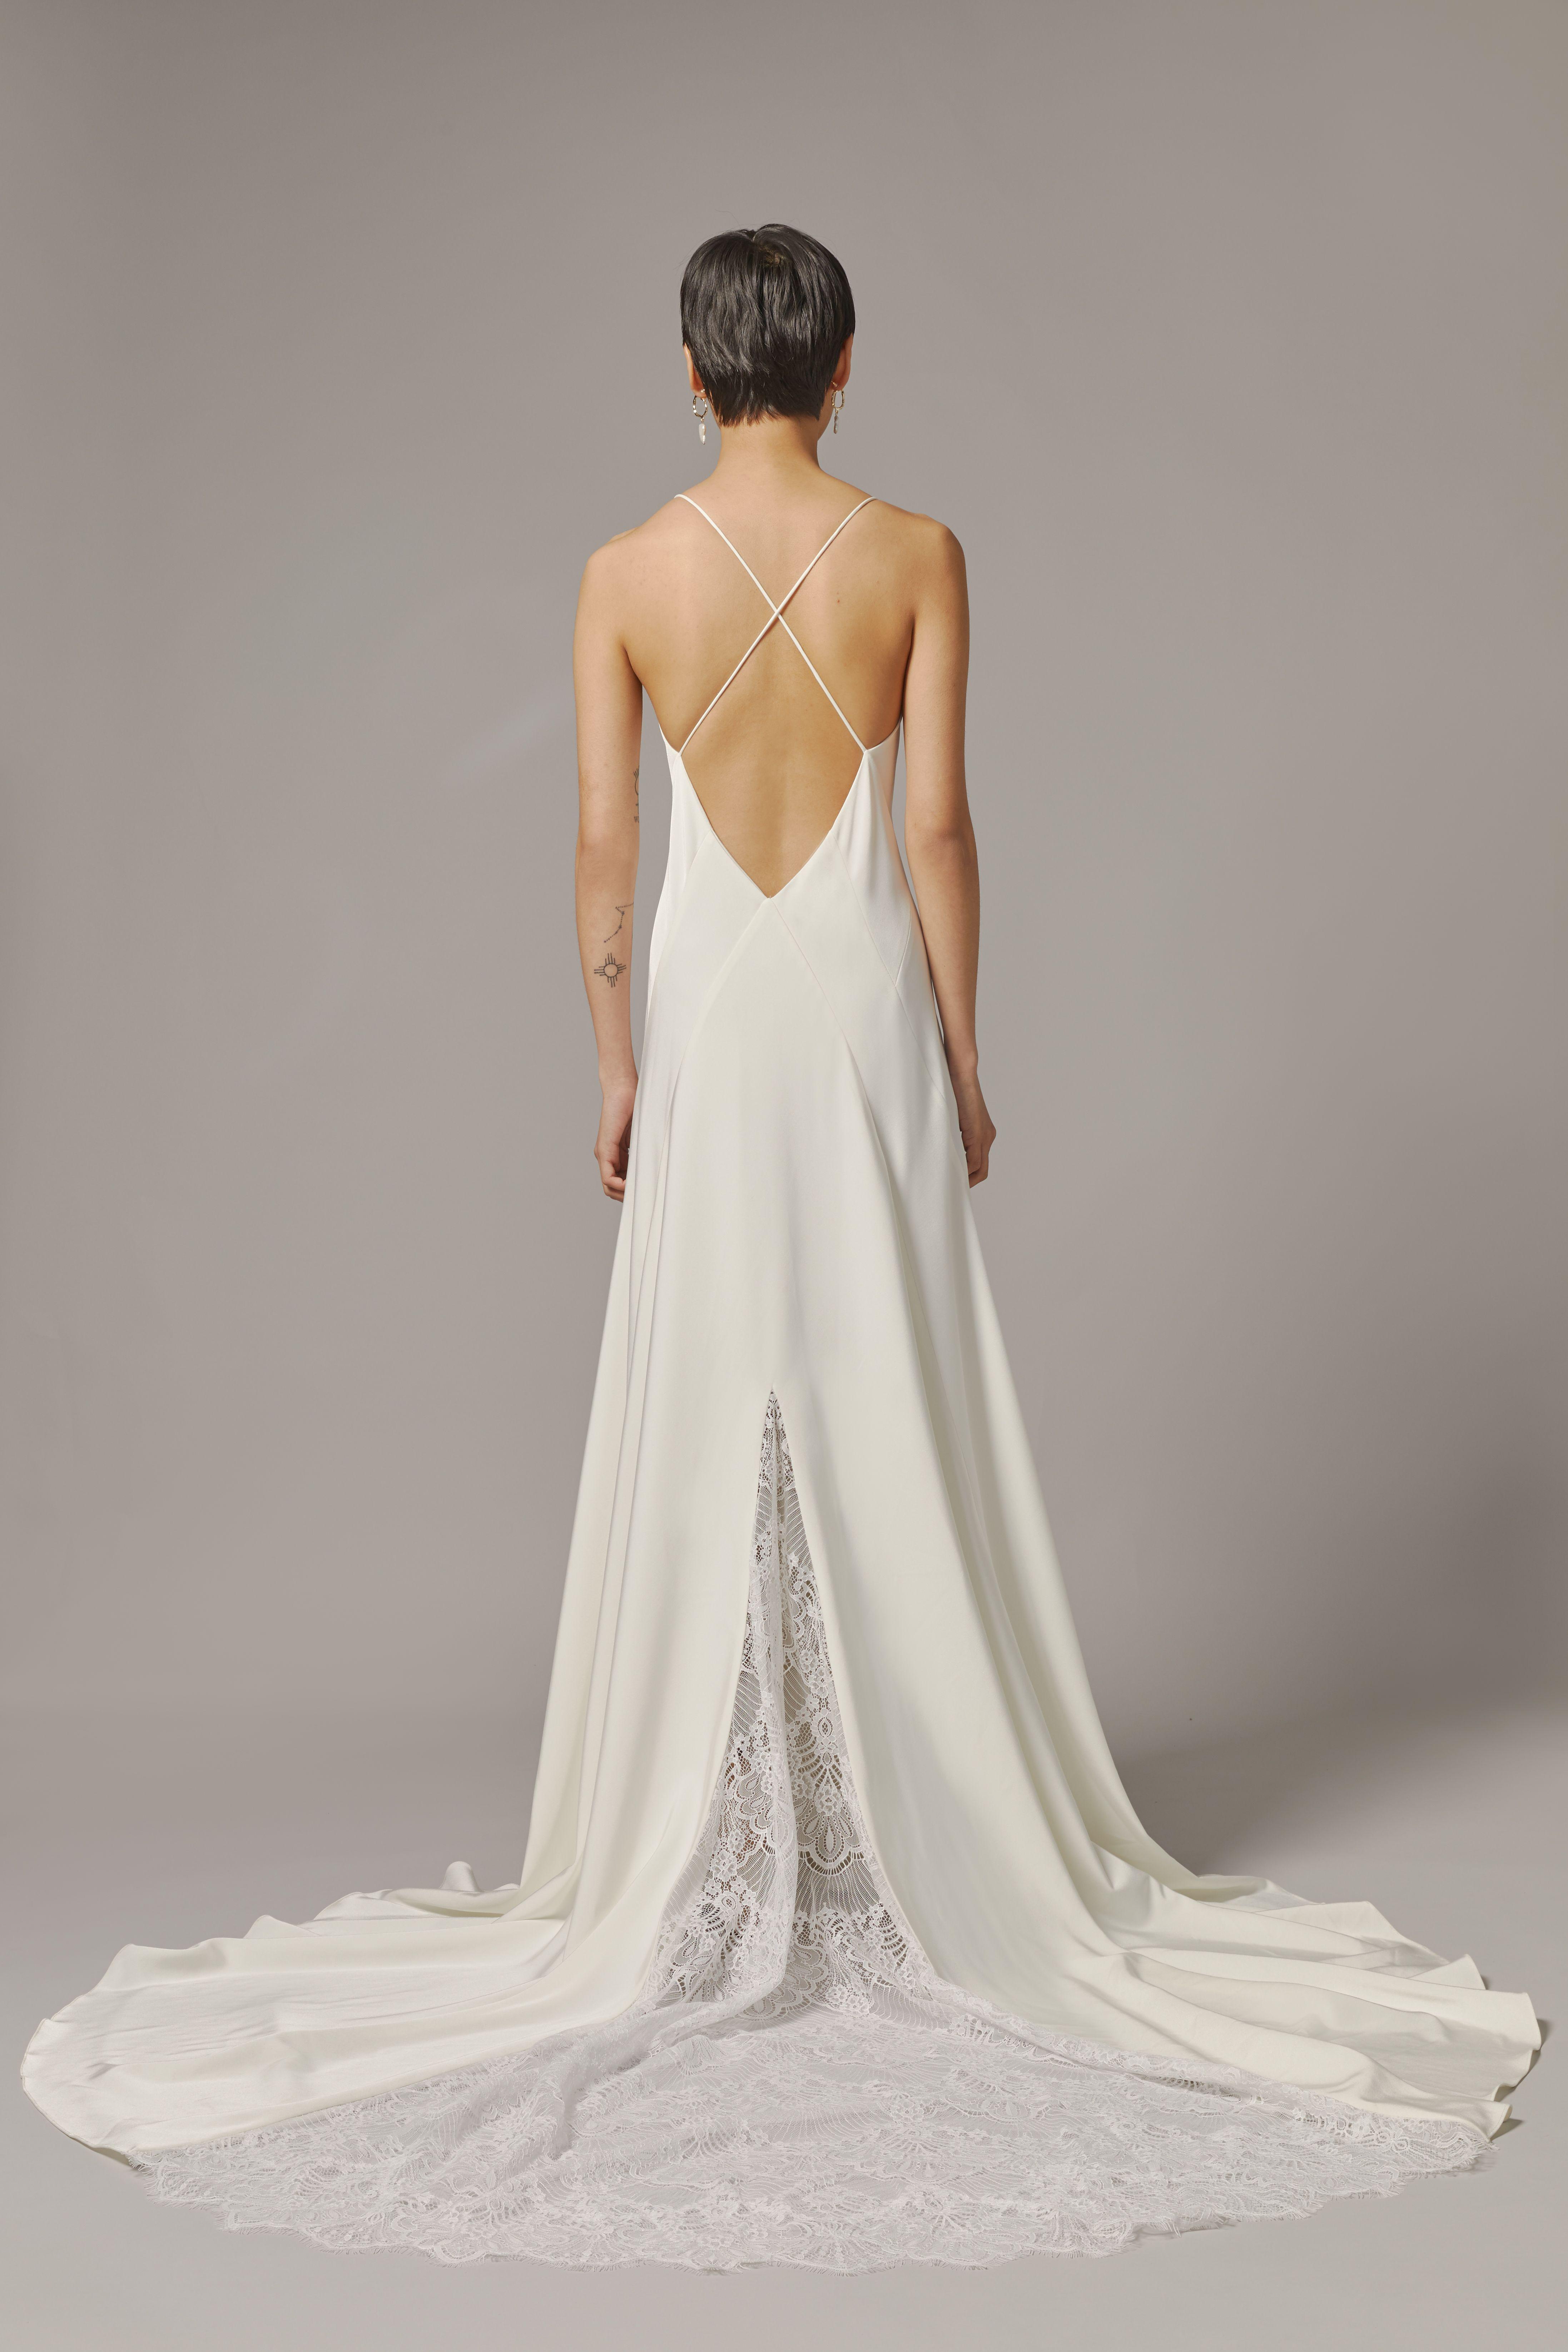 N Simone Wedding Dresses Simple Perfect Wedding Dress Modern Wedding Dress